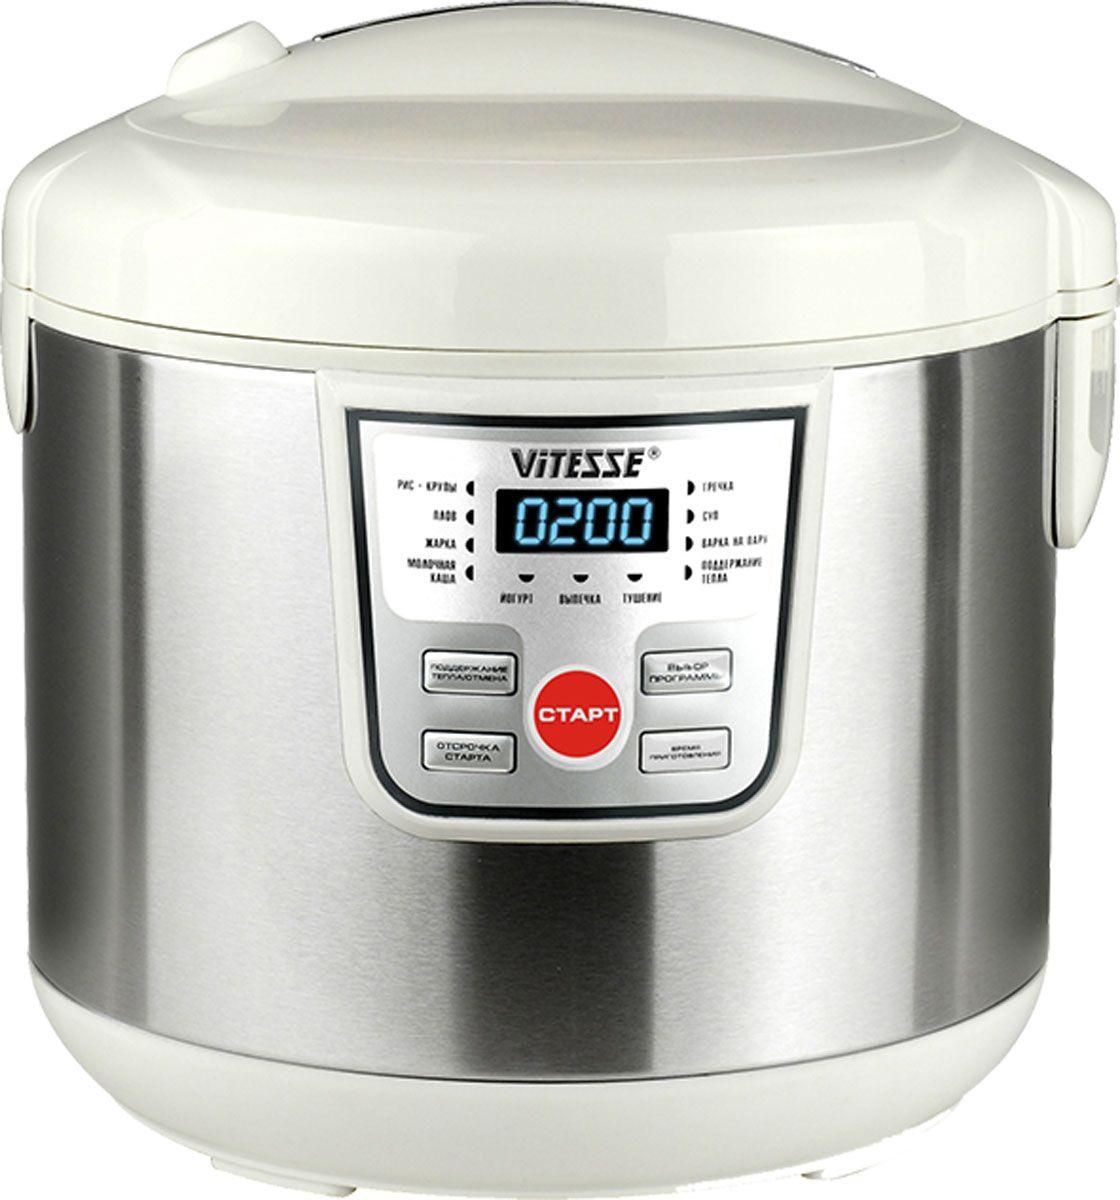 Купить Vitesse VS-581 мультиварка, White